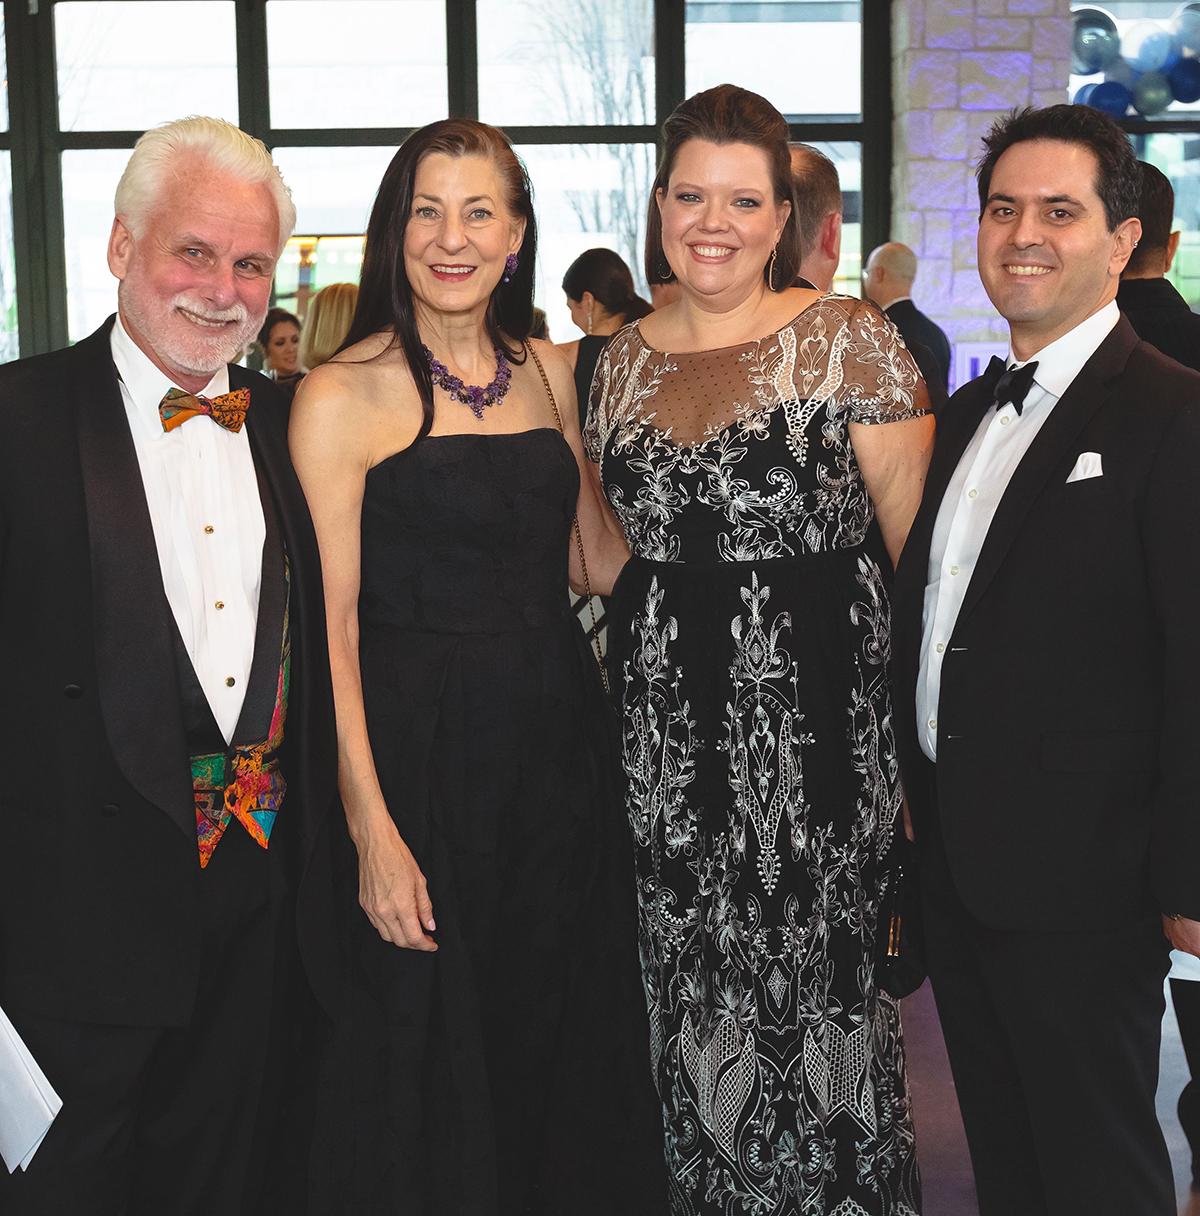 Dan and Hon. Darlene Byrne & Emily Rudenick-LeBlanc and Toby LeBlanc